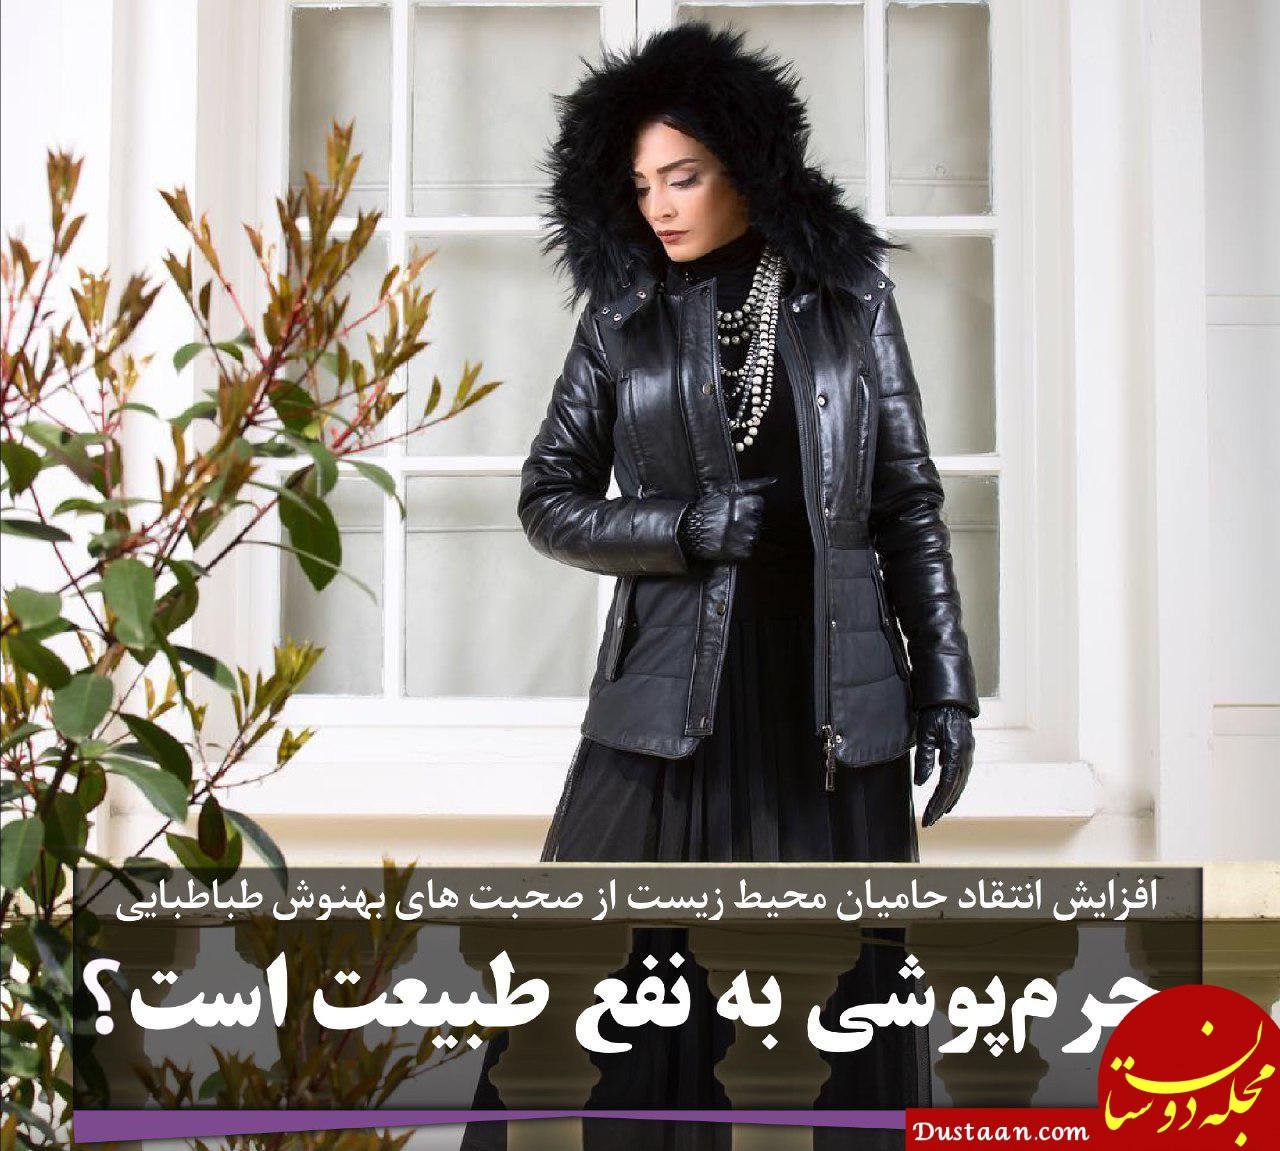 www.dustaan.com انتقاد حامیان محیط زیست از بهنوش طباطبایی: چرم پوشی به نفع طبیعت است؟